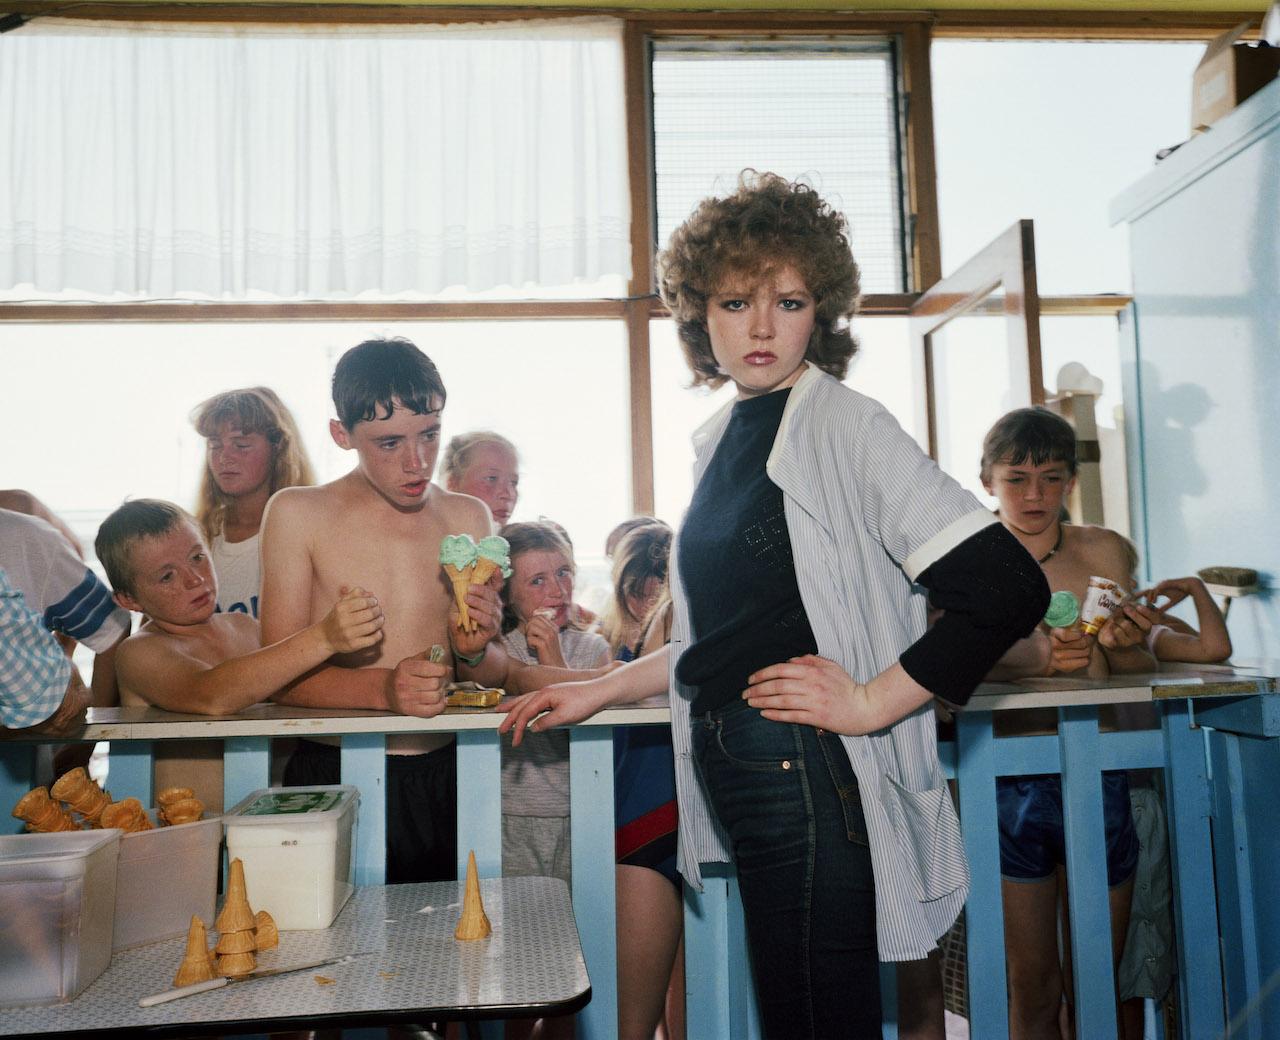 New Brighton UK From 'The Last Resort' , 1983-85 © Martin Parr/Magnum Photos